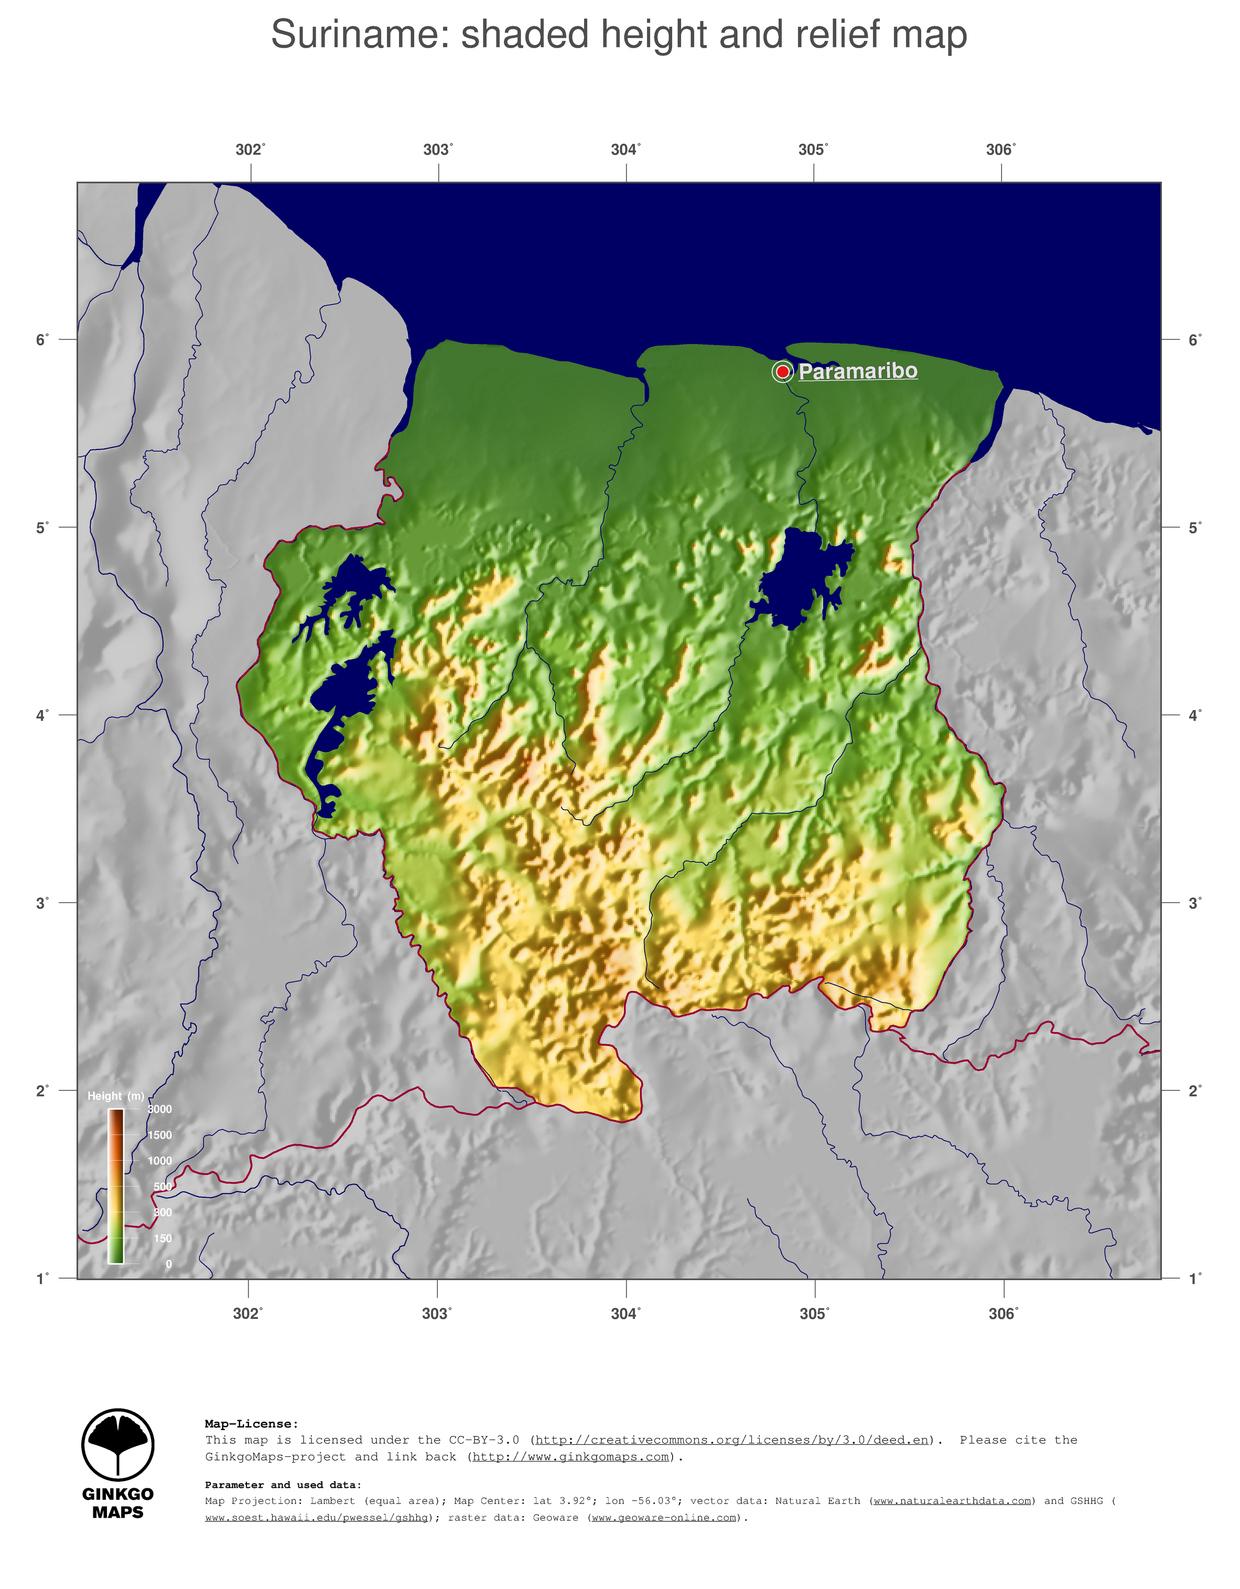 Map Suriname GinkgoMaps Continent South America Region Suriname - Suriname map